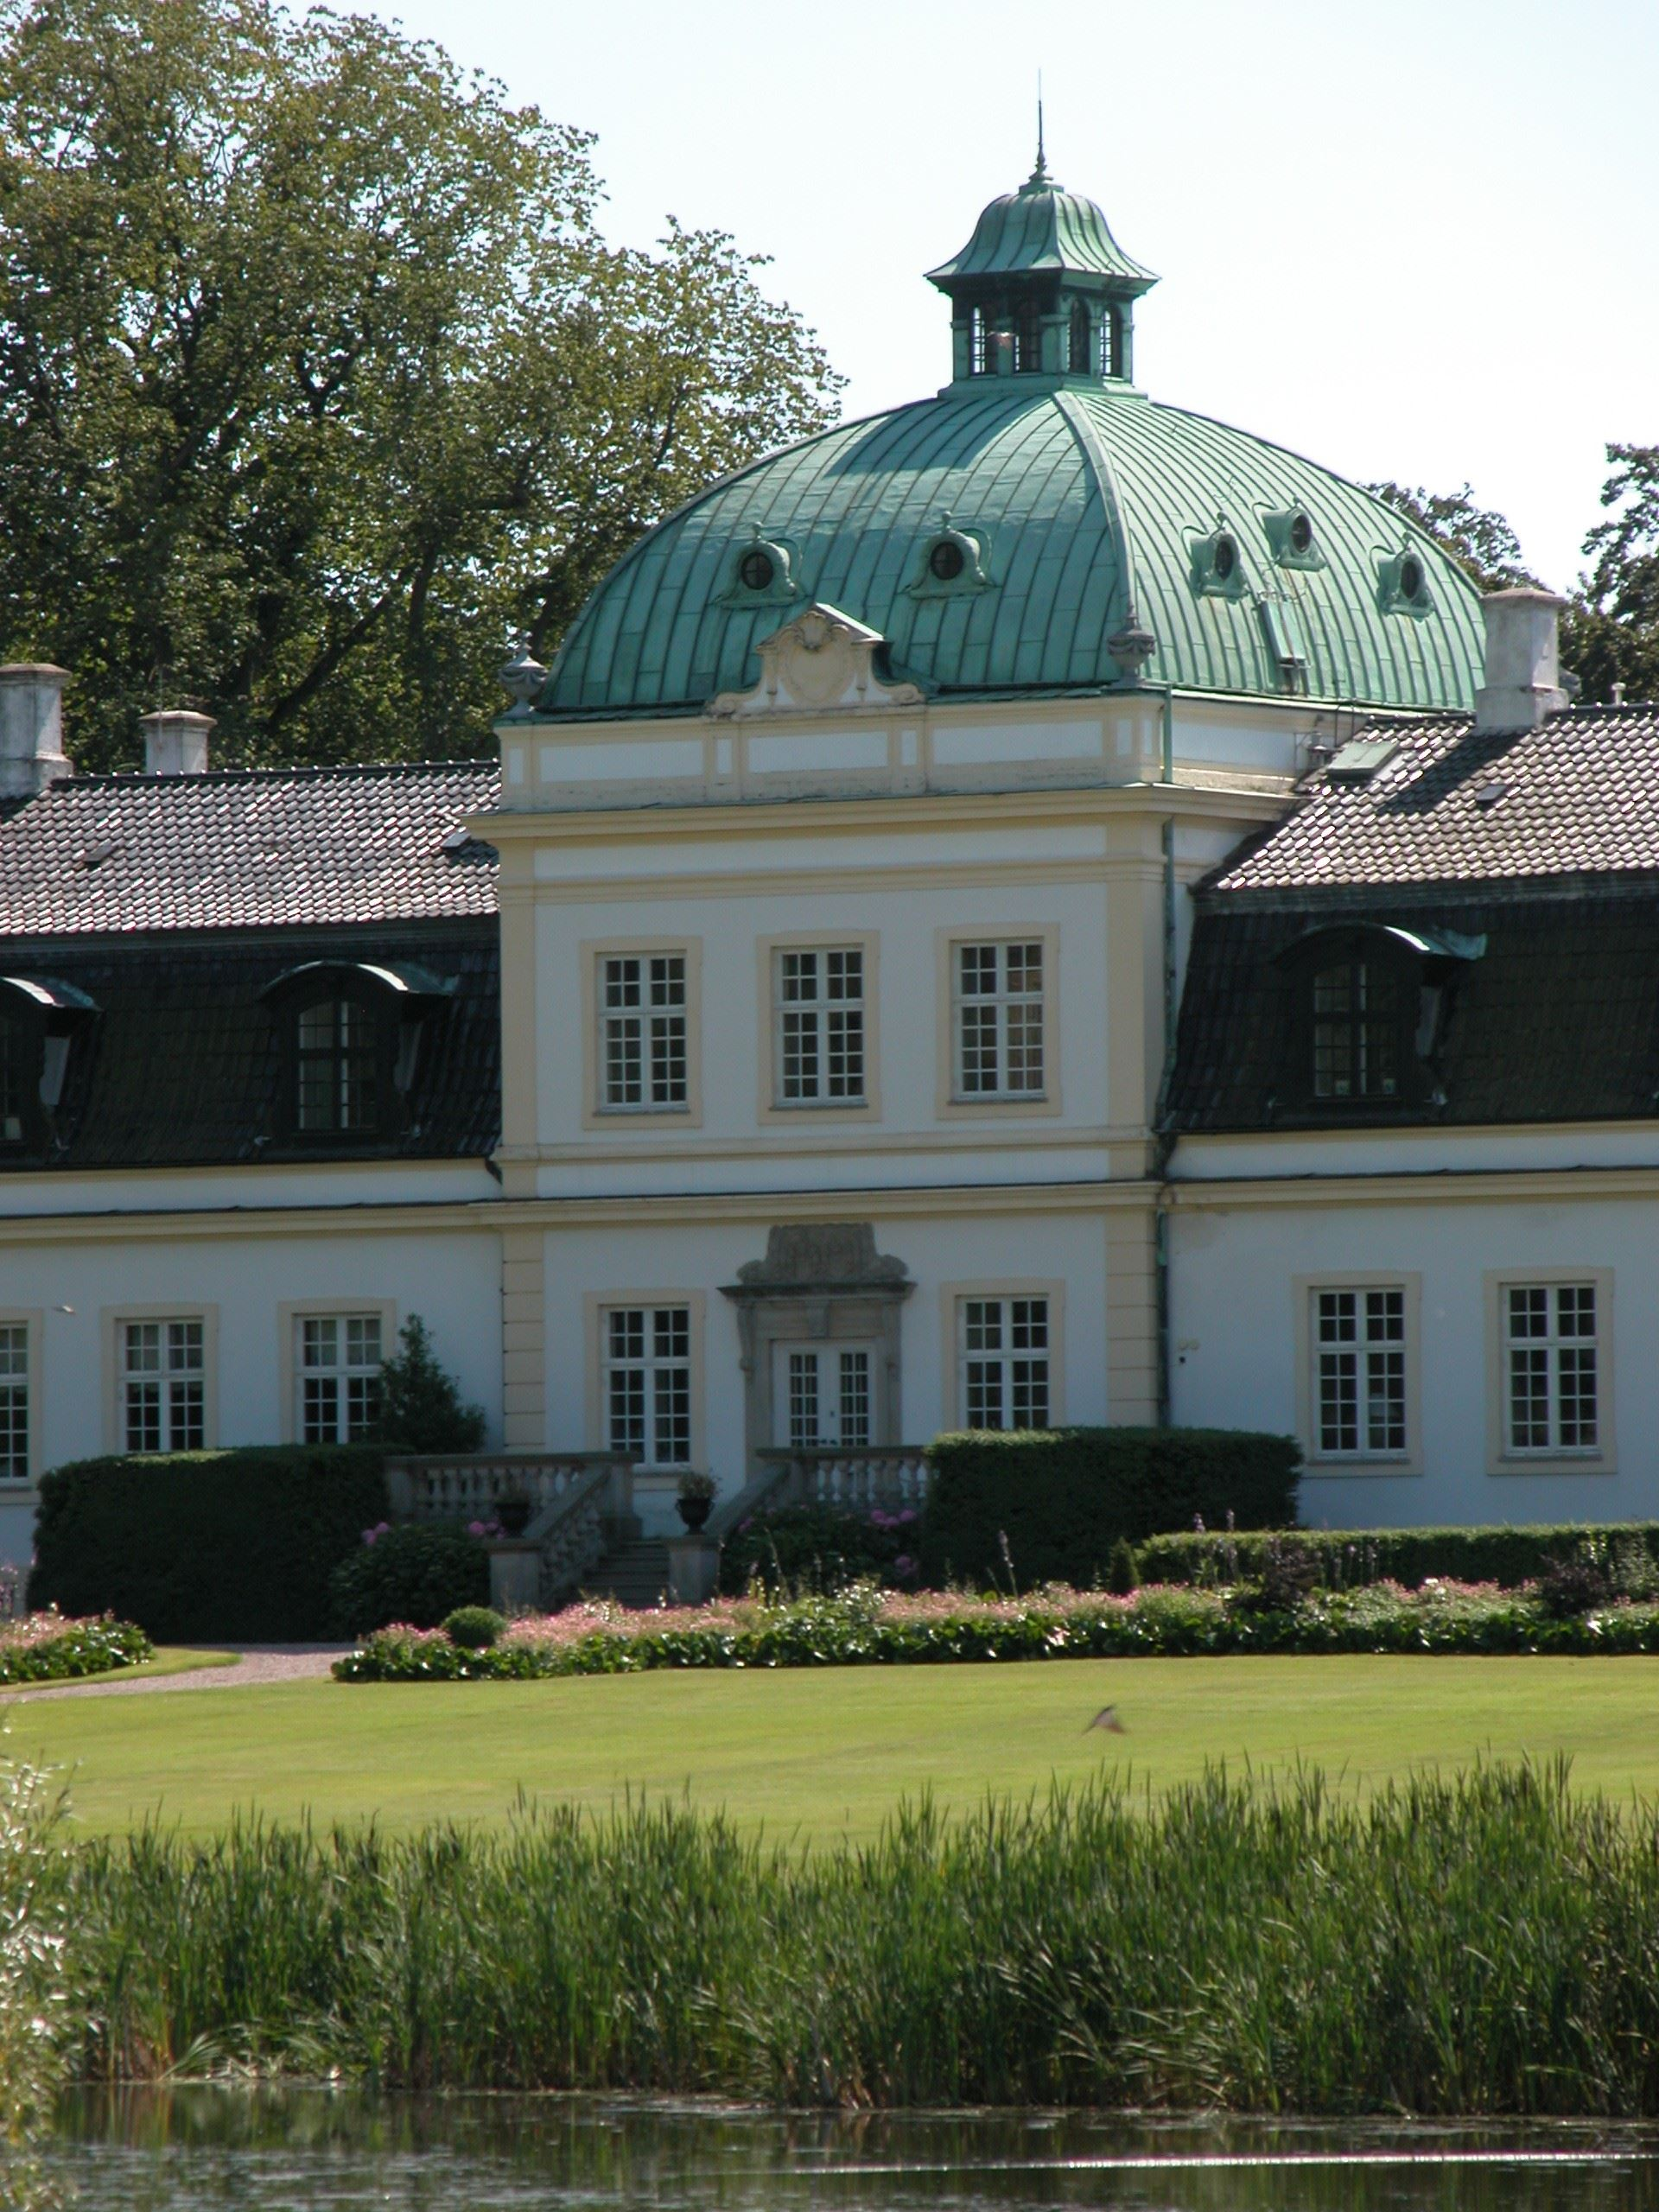 Jordberga Castle